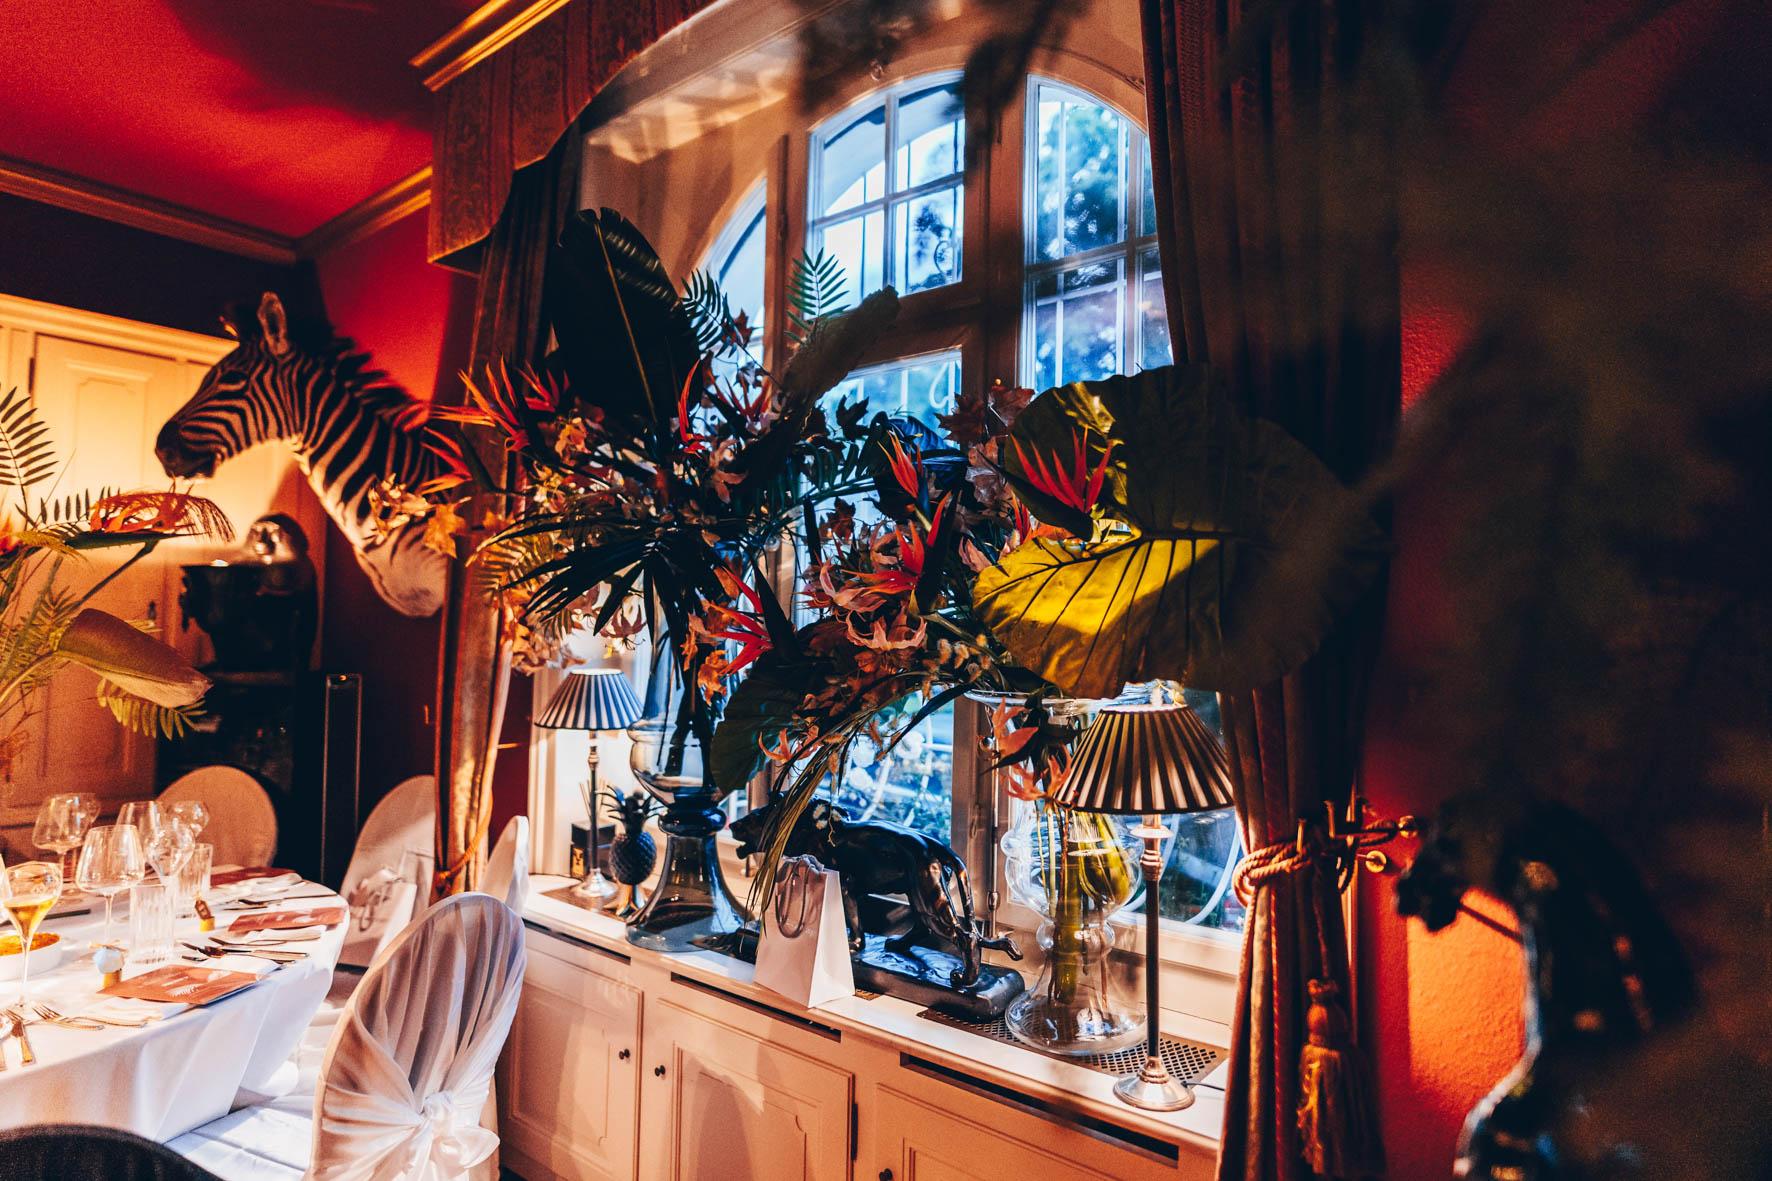 Konrad-lifestyle-art-basel-%22prestige%22-2019-167.jpg